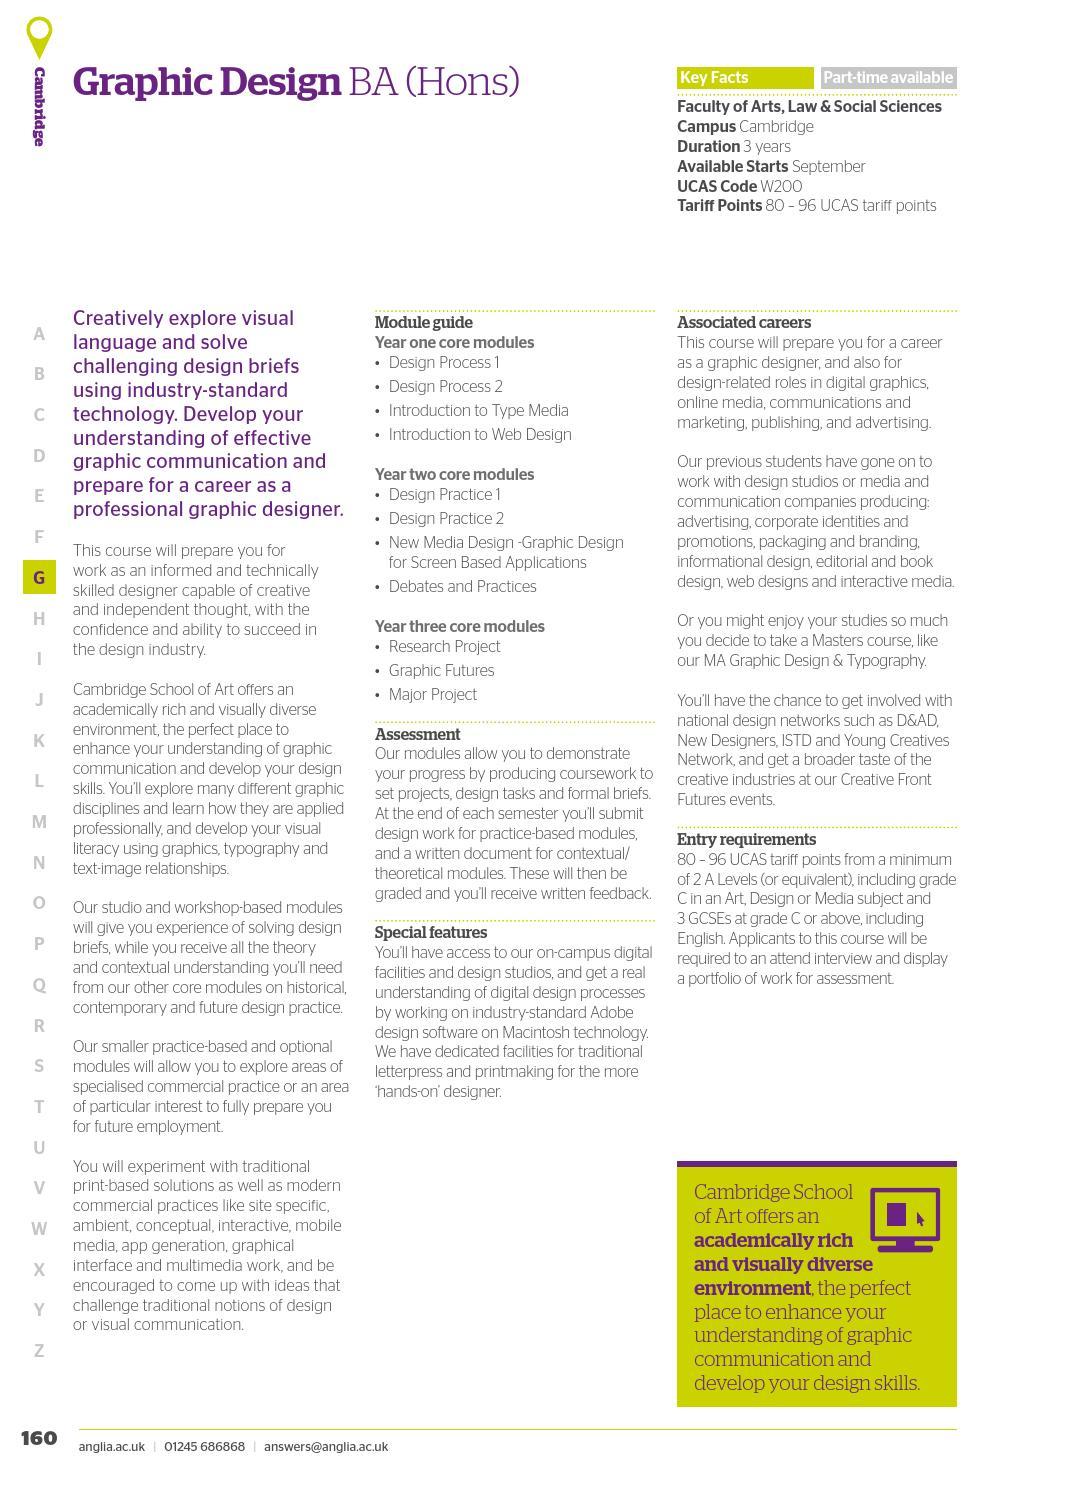 Anglia Ruskin University Ug Prospectus 2017 18 By Angliaruskin Issuu